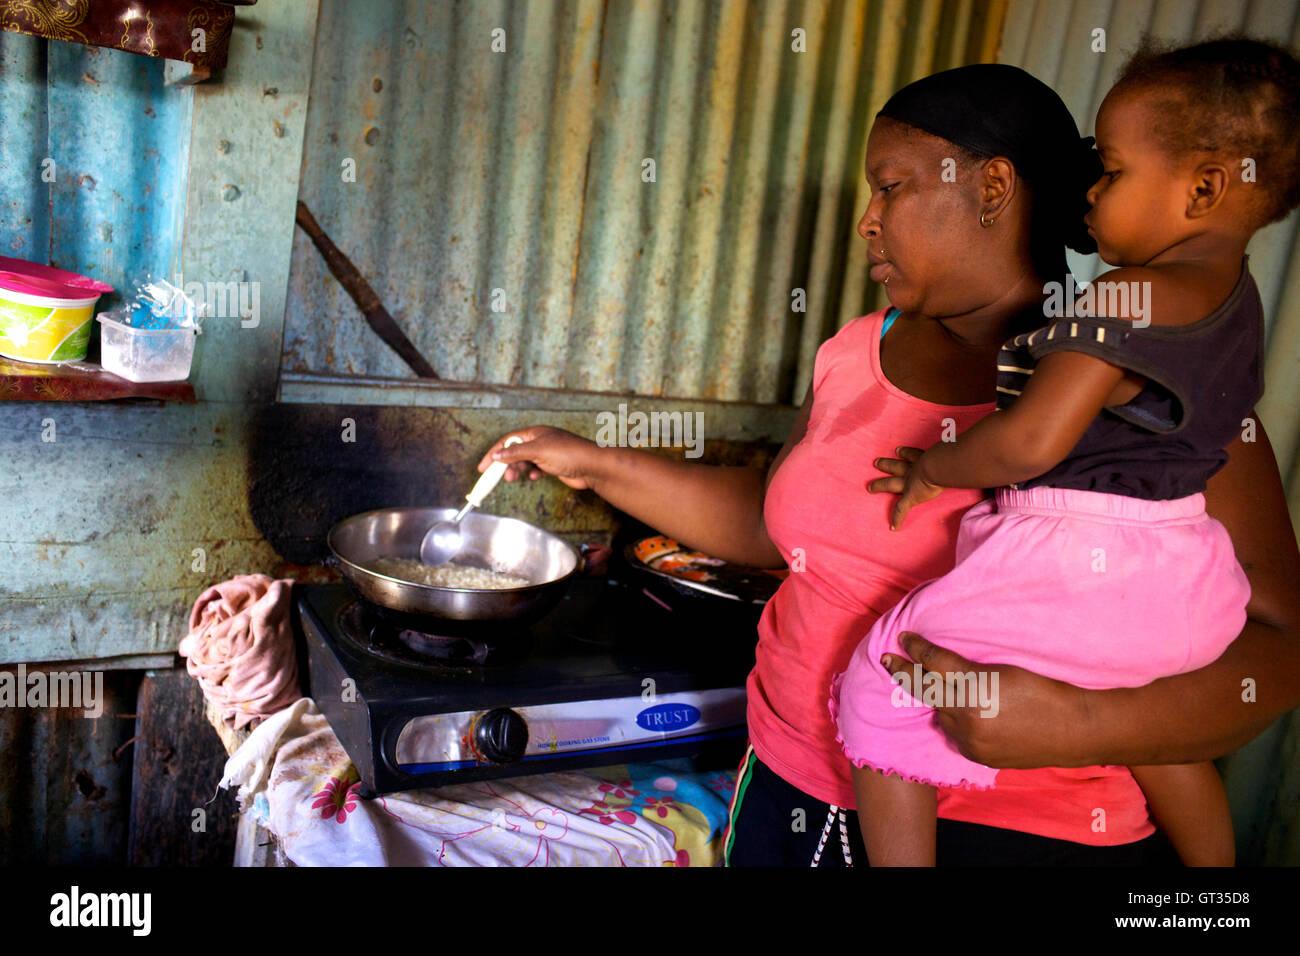 Chagos -  06/04/2012  -  Mauritius  -  Meri Elysee, chagos refugee in her kitchen, Baie du Tombeau, Mauritius   Stock Photo